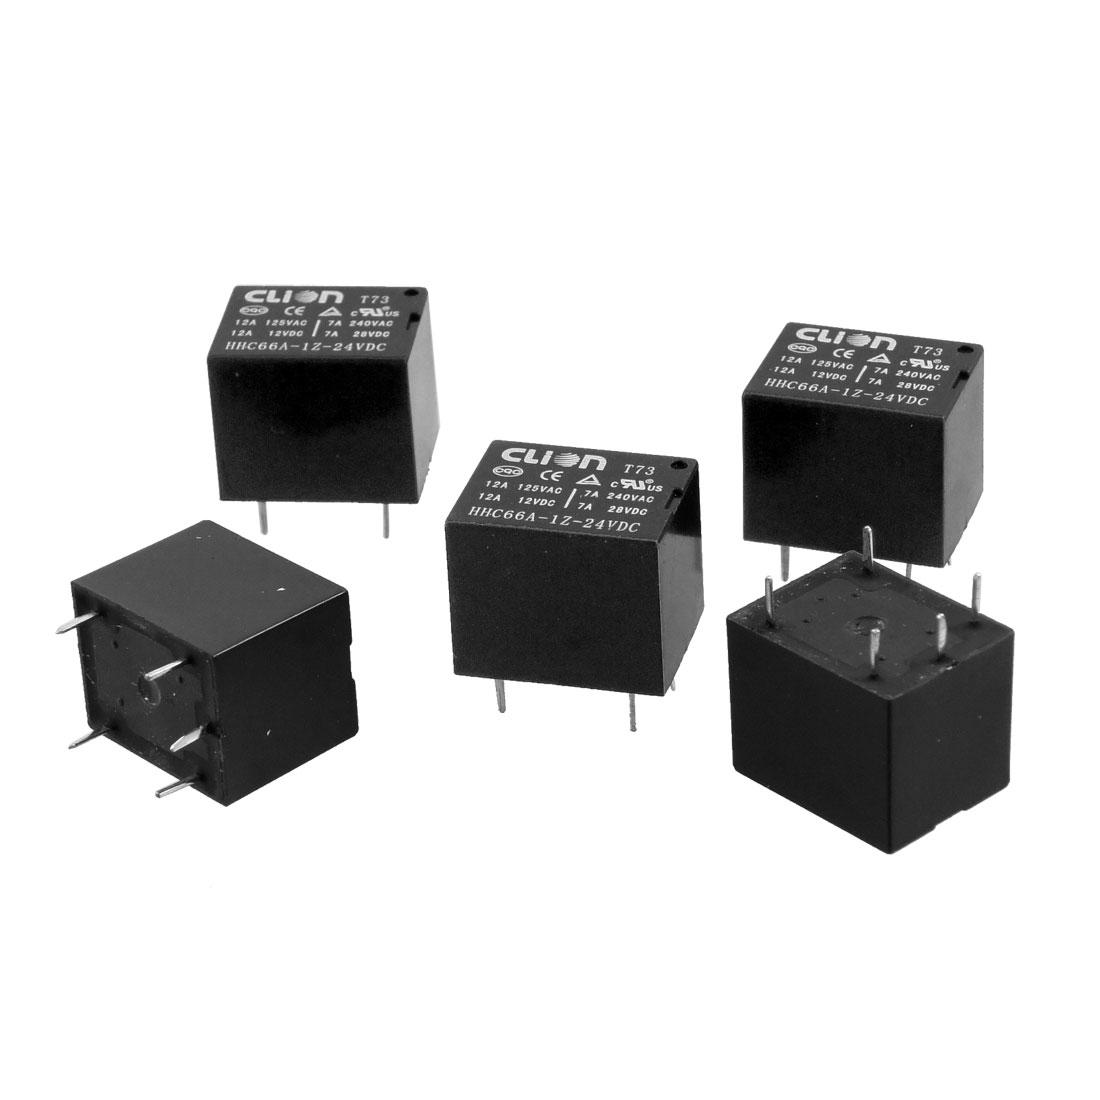 5 x DC 24V Coil 12A 125 AC/12V DC 5 Pins SPDT PCB Power Relay HHC66A-1Z(T73)